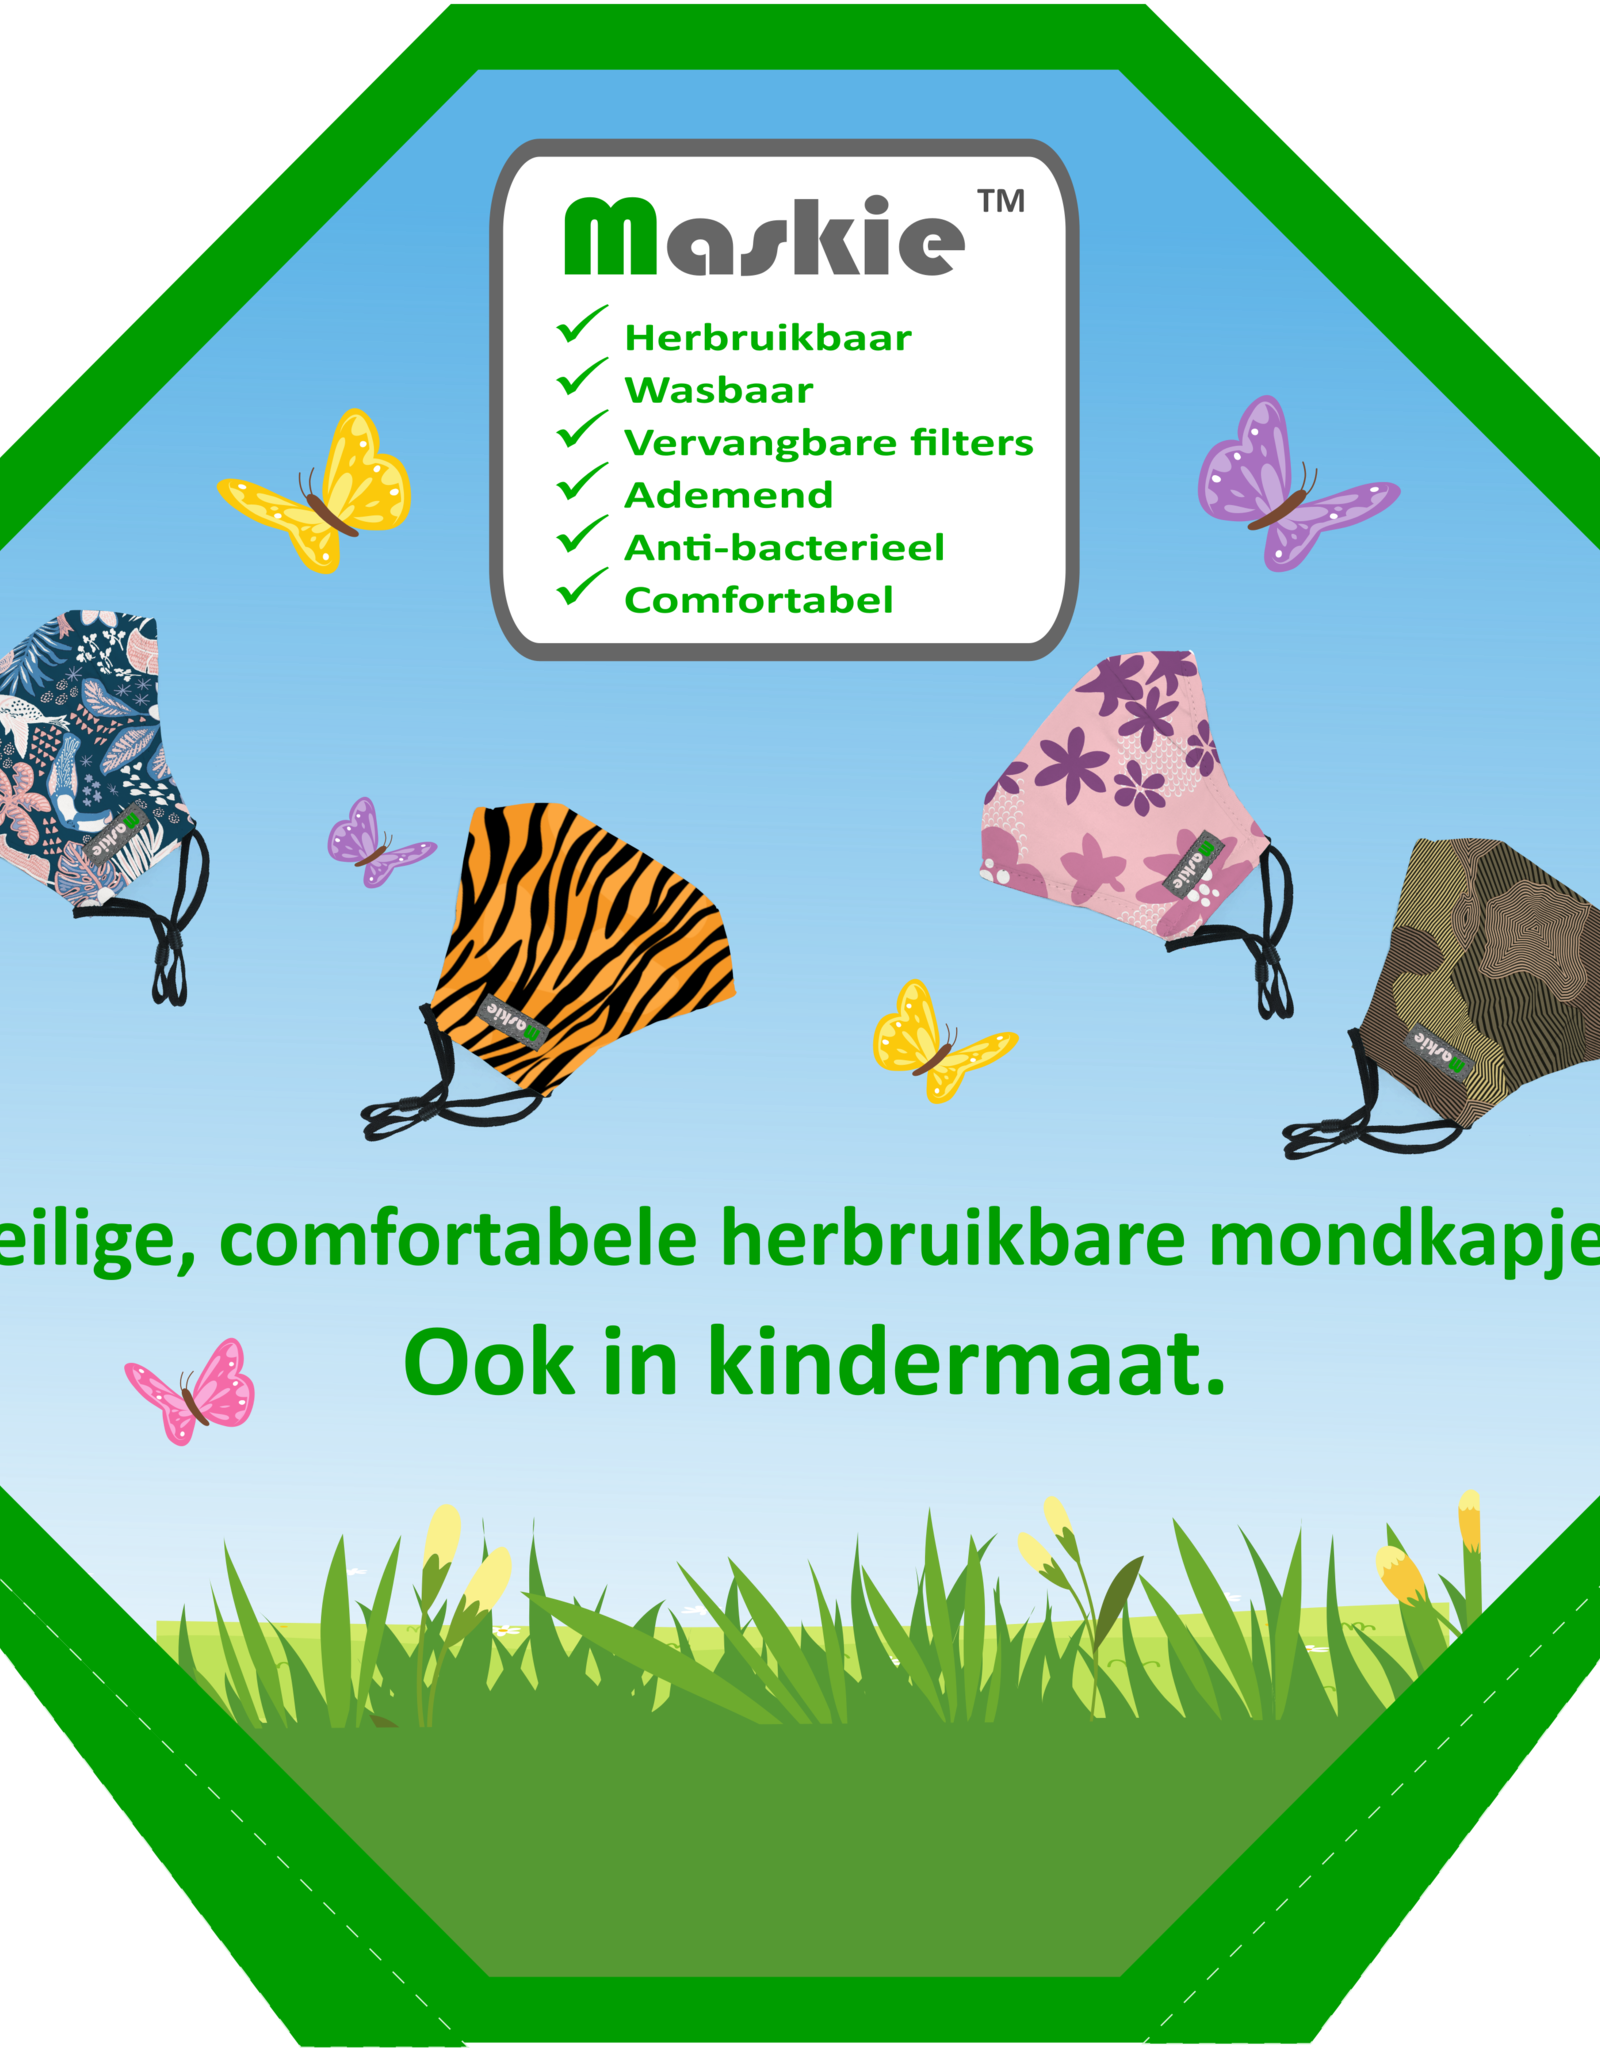 Maskie Maskie mill - 80 Maskie masks + BONUS 18 Artist Line (until November 7)